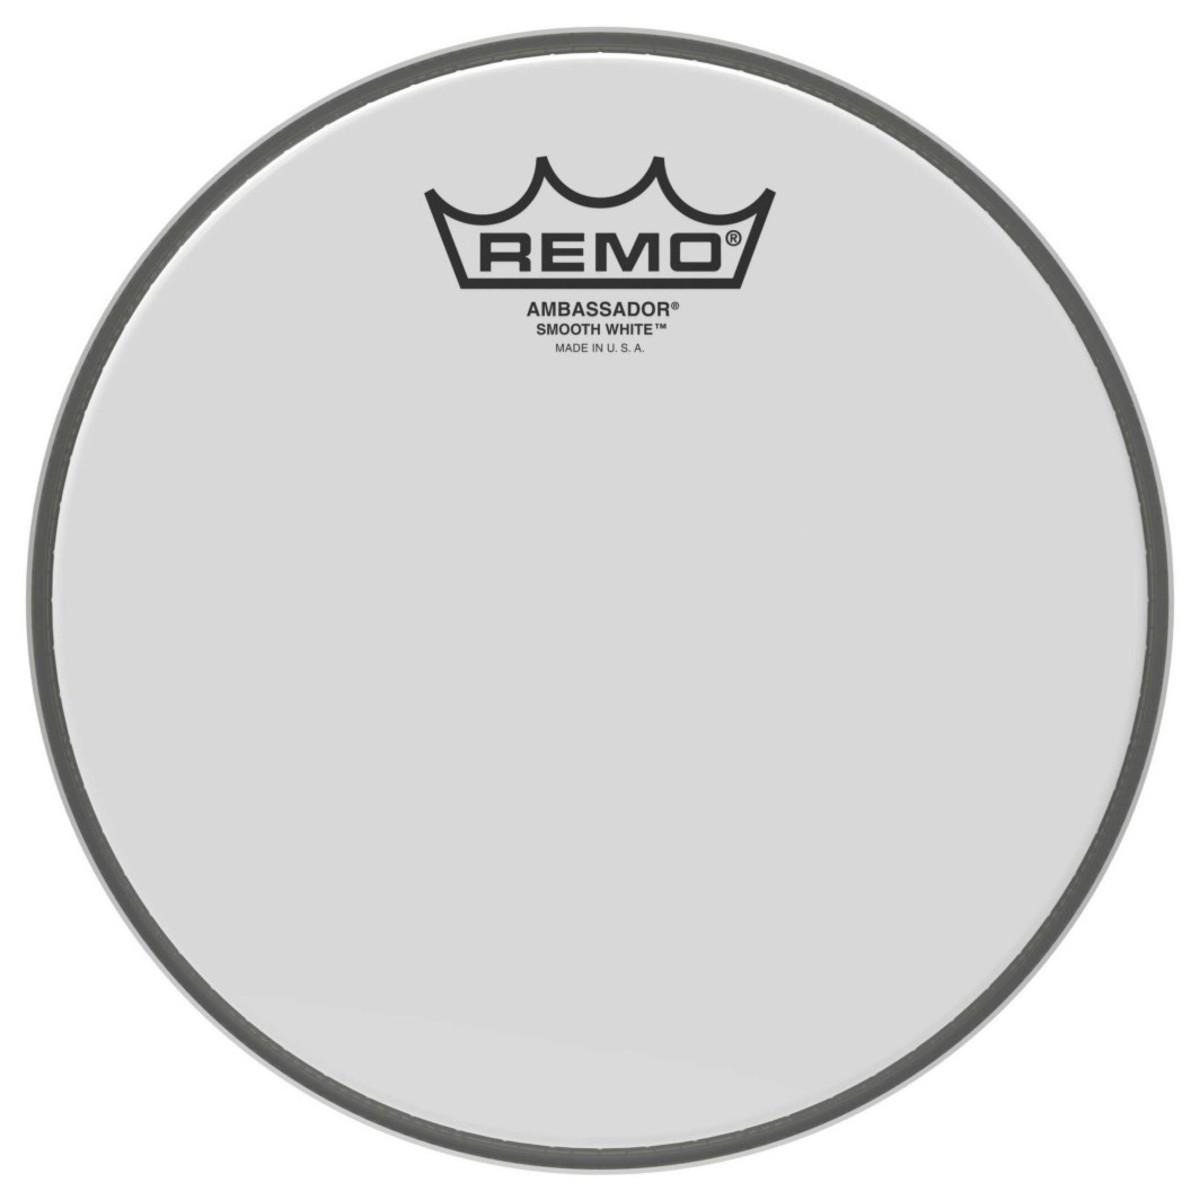 Remo Ambassador Smooth White 12 Drum Head